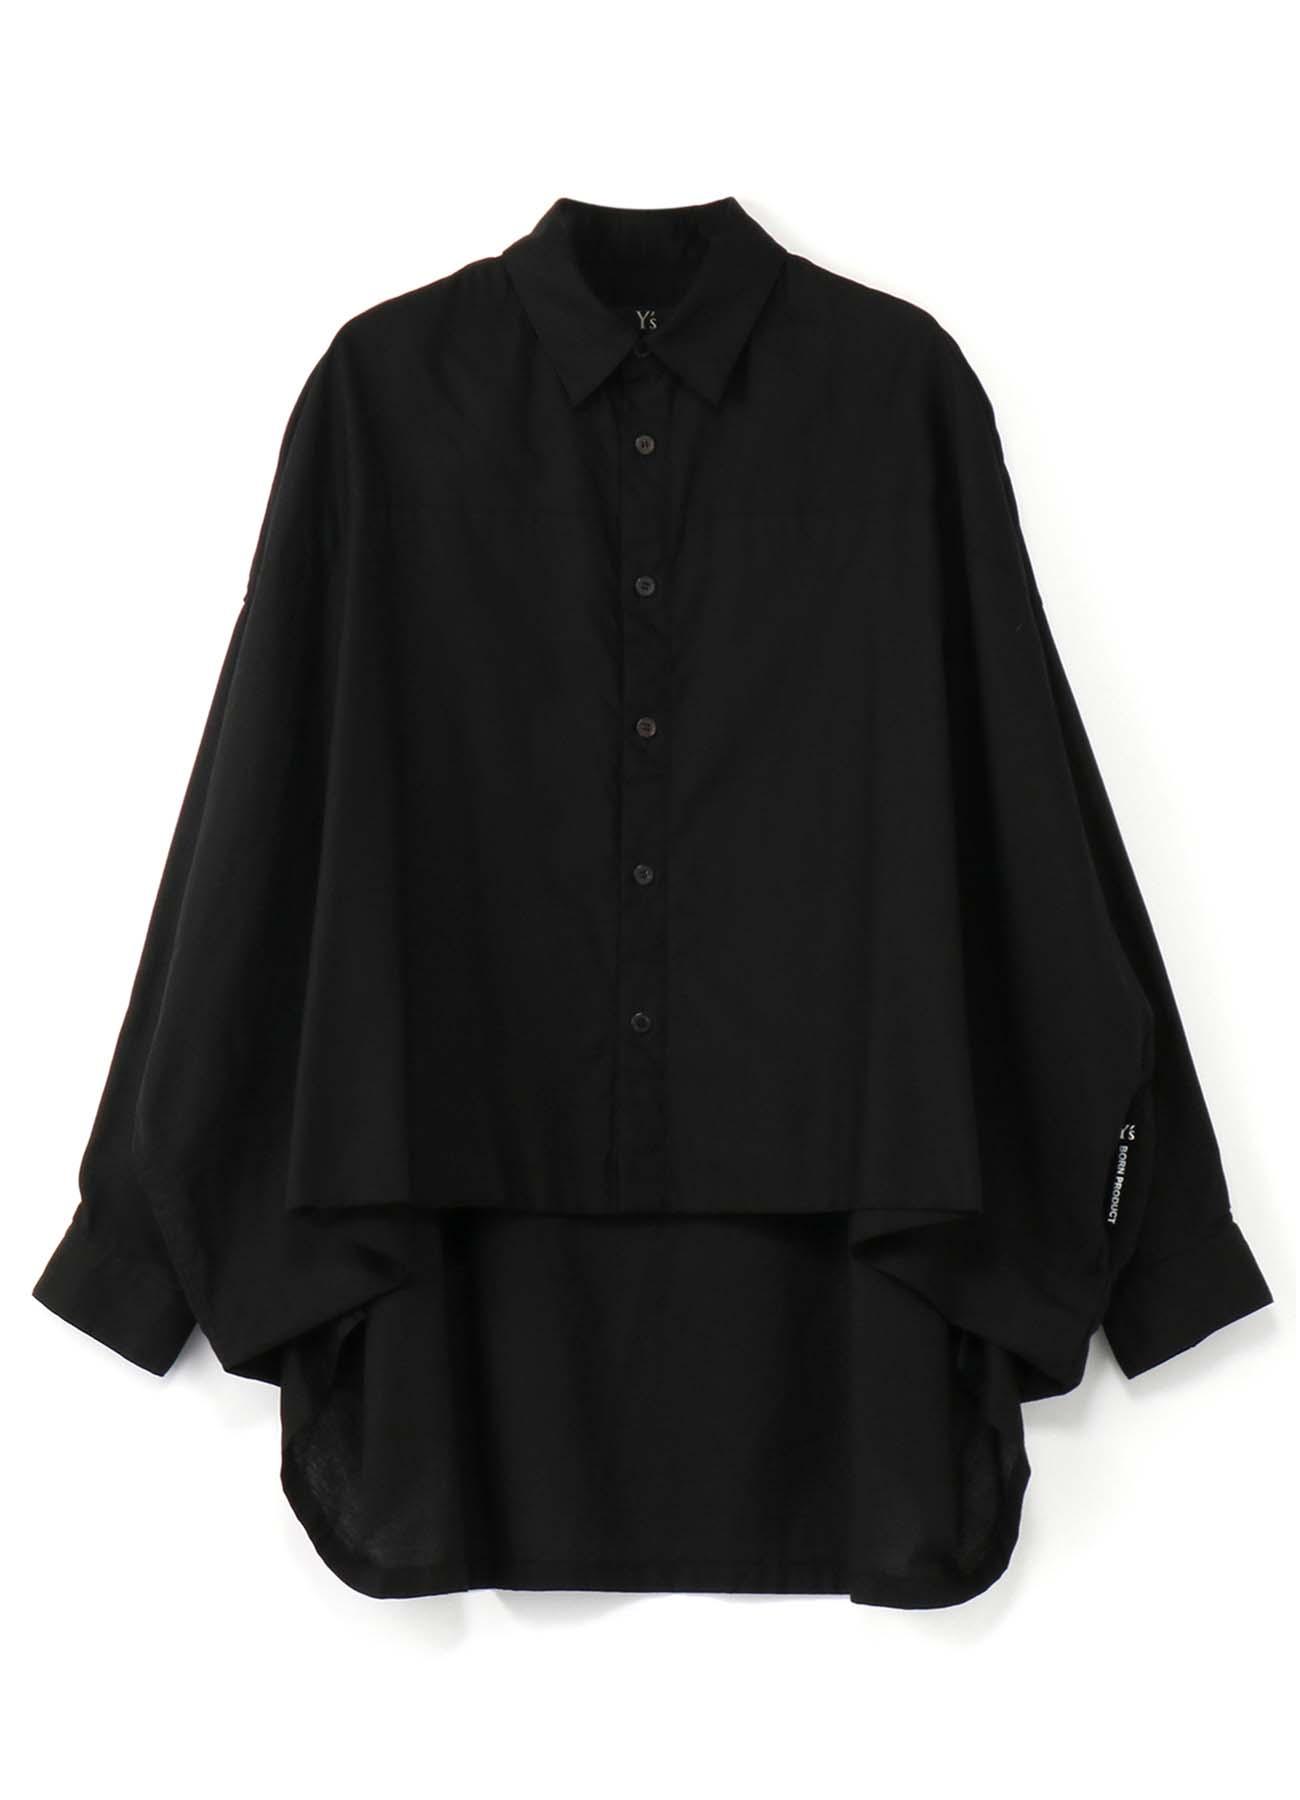 Y's-BORN PRODUCT 前后摆不对称宽松衬衫